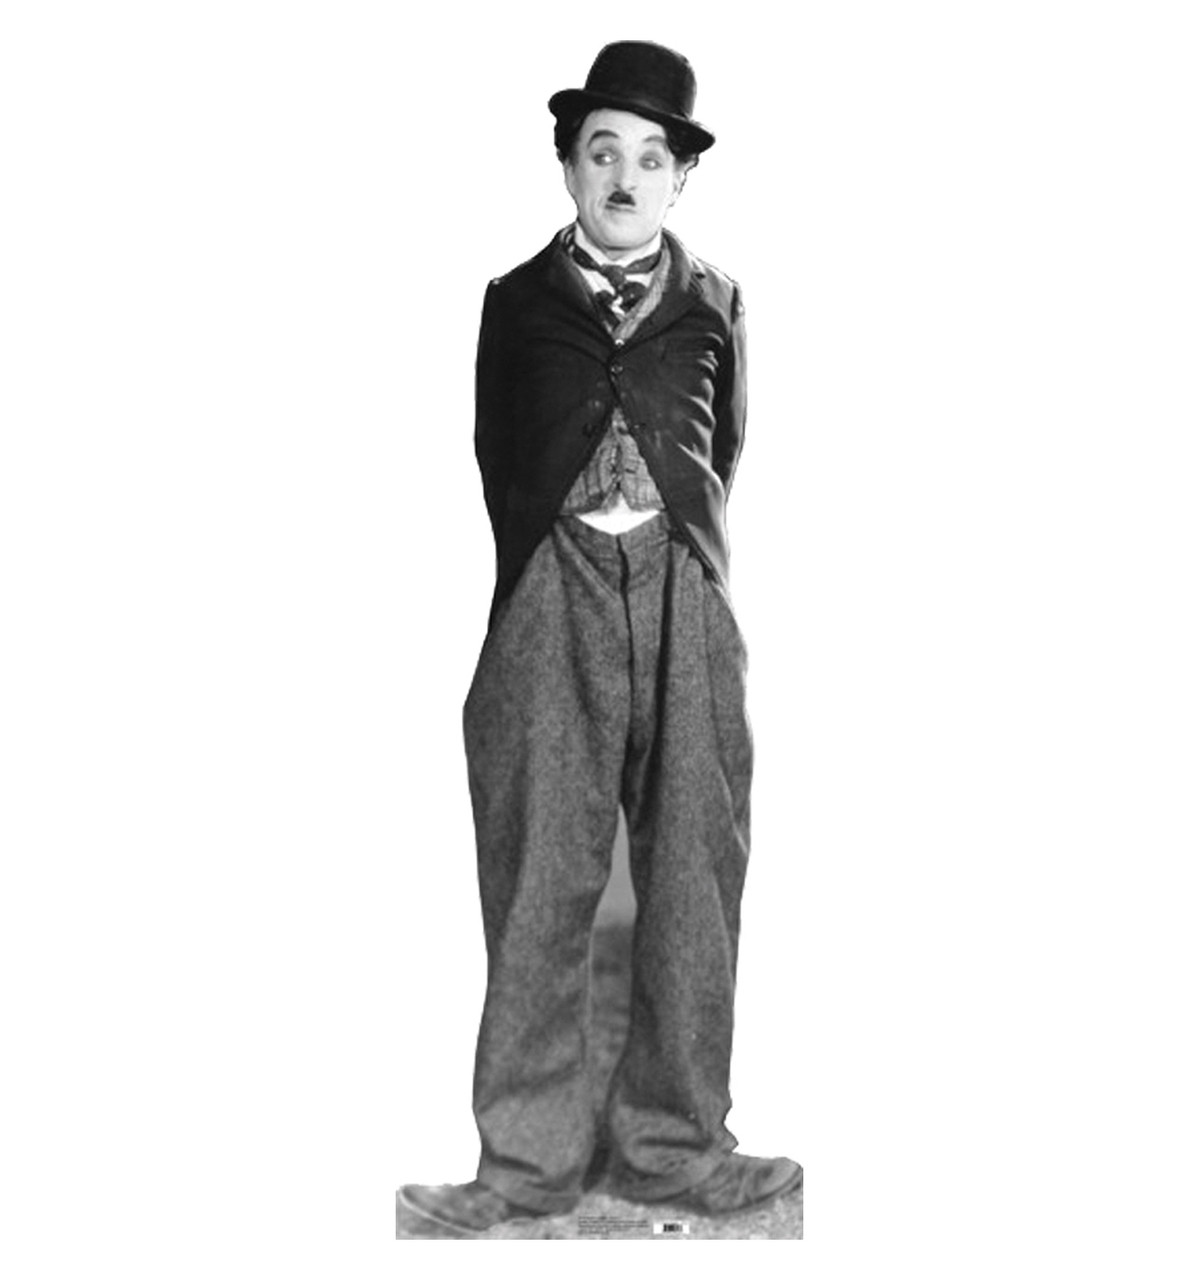 Life-size Charlie Chaplin - Tramp 3 Cardboard Standup | Cardboard Cutout